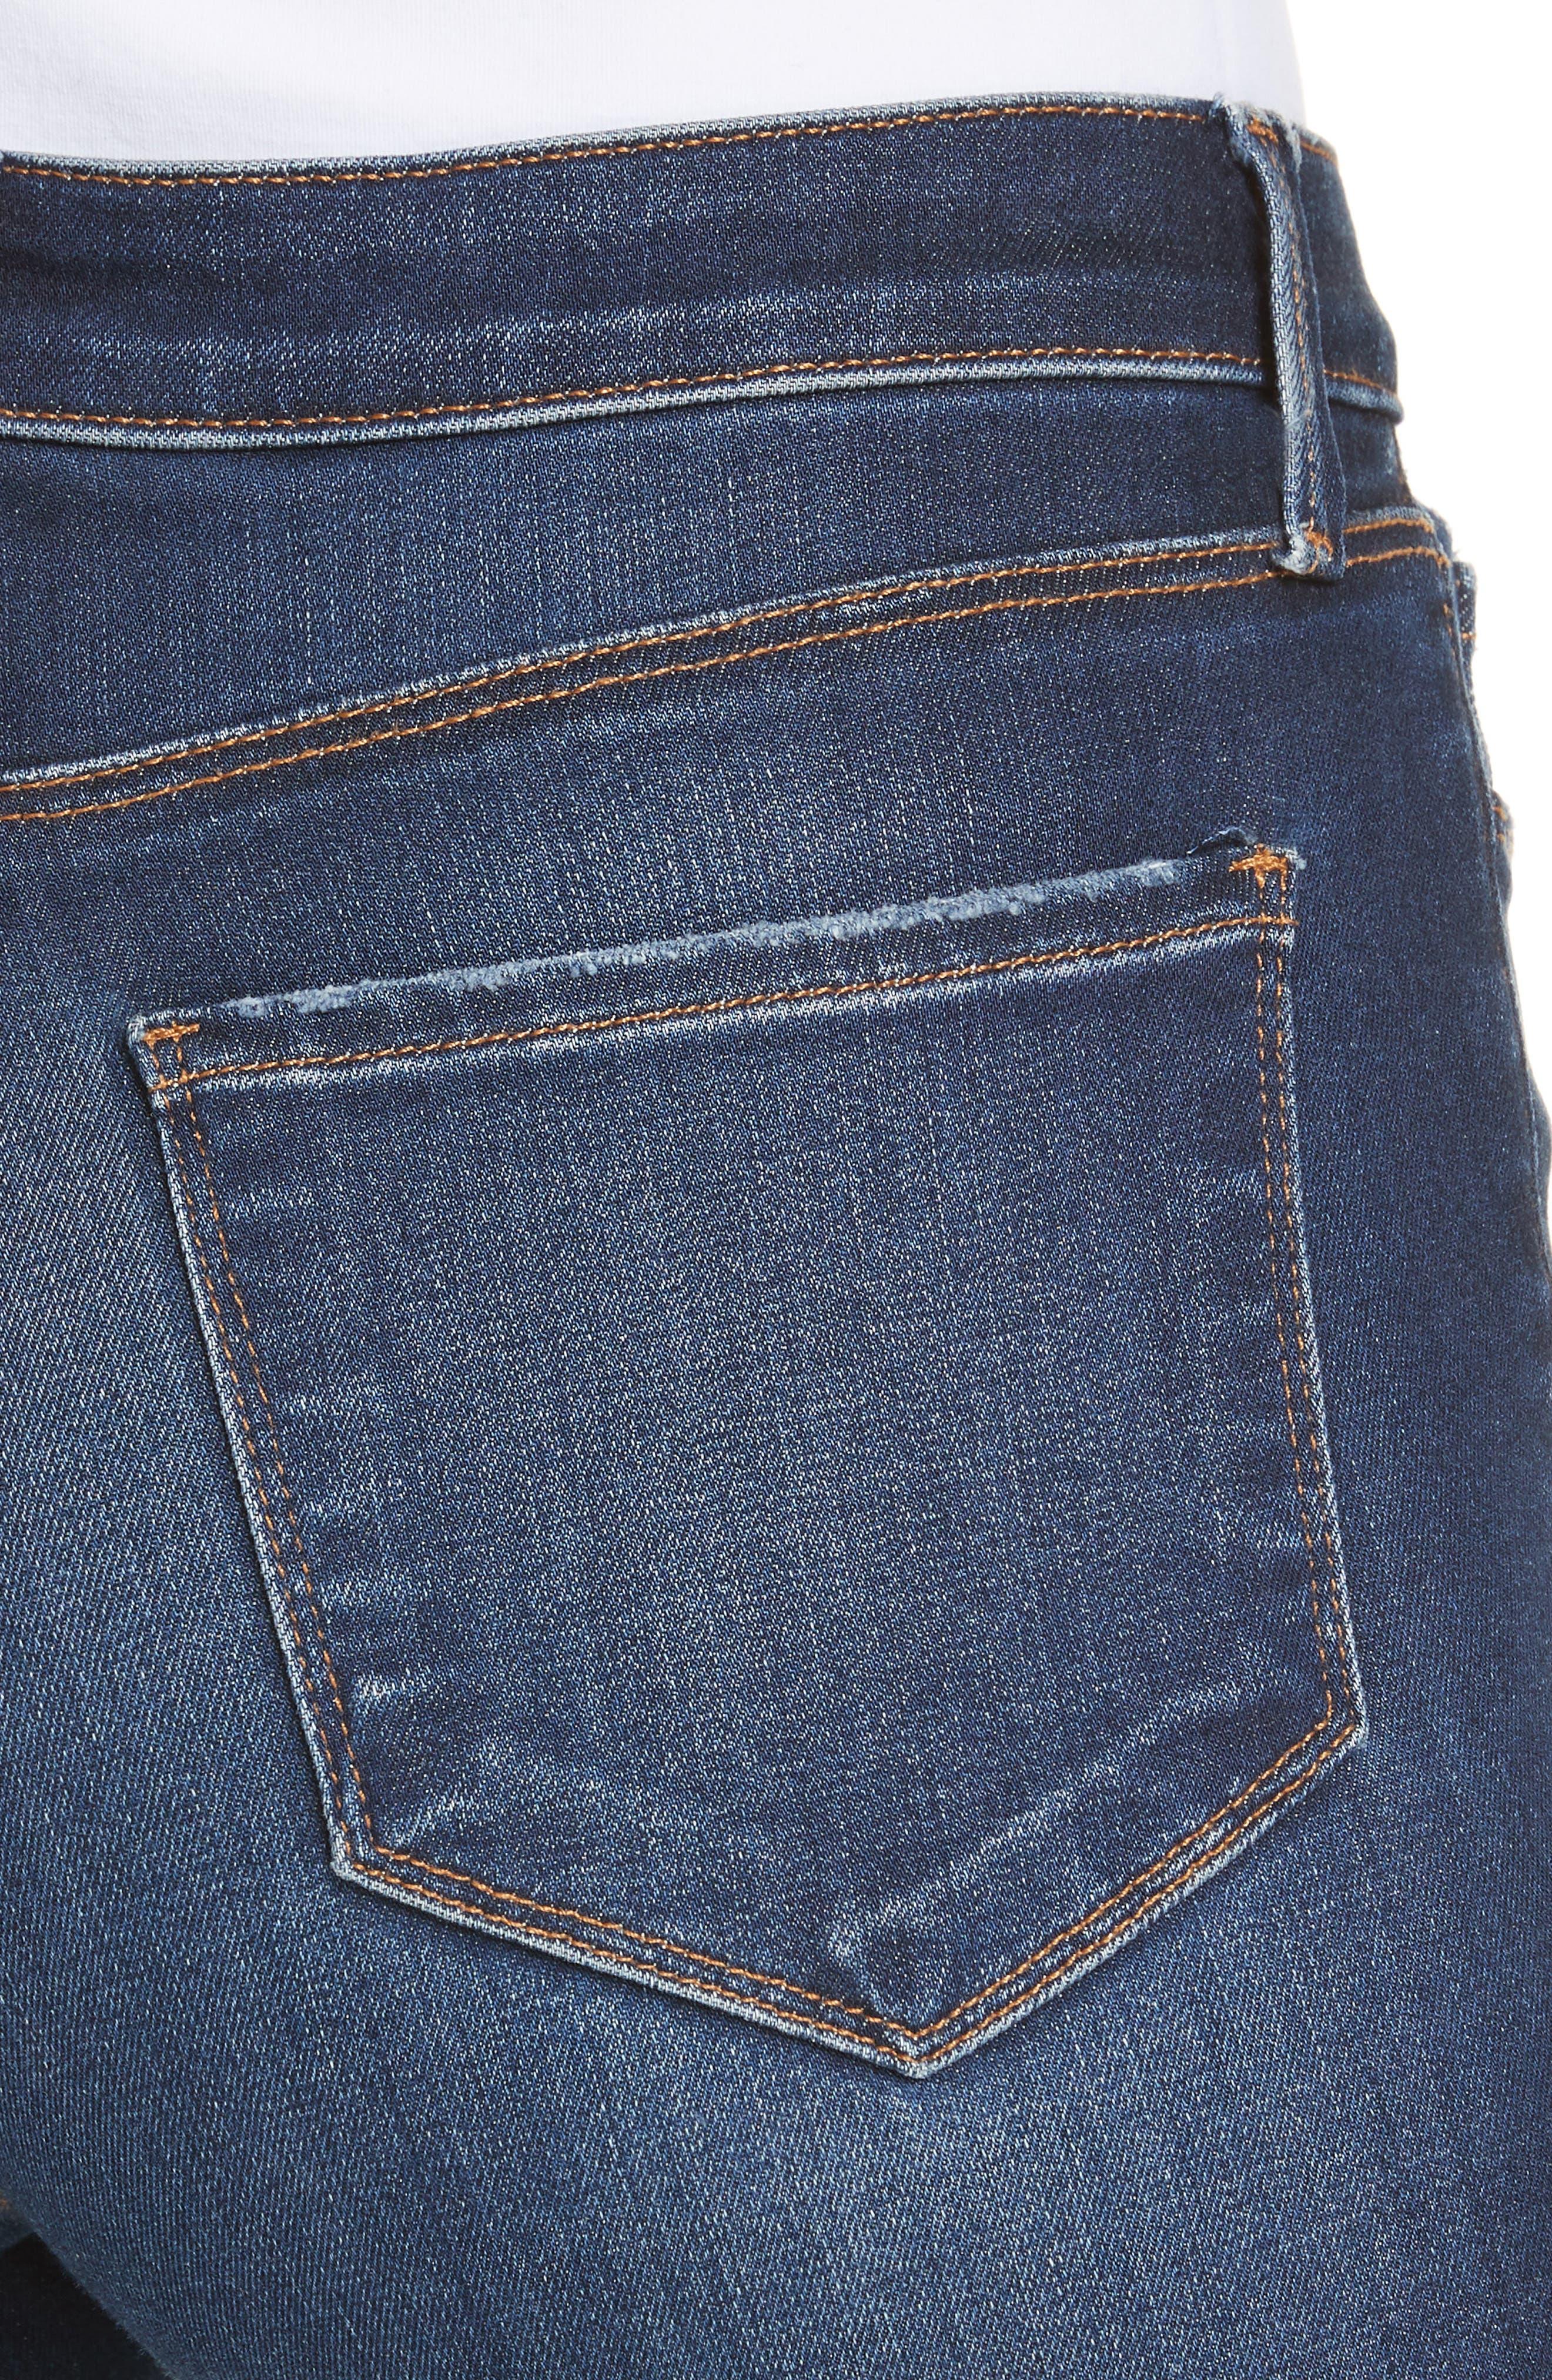 Margot Ripped Skinny Jeans,                             Alternate thumbnail 4, color,                             BALTIC DESTRUCT